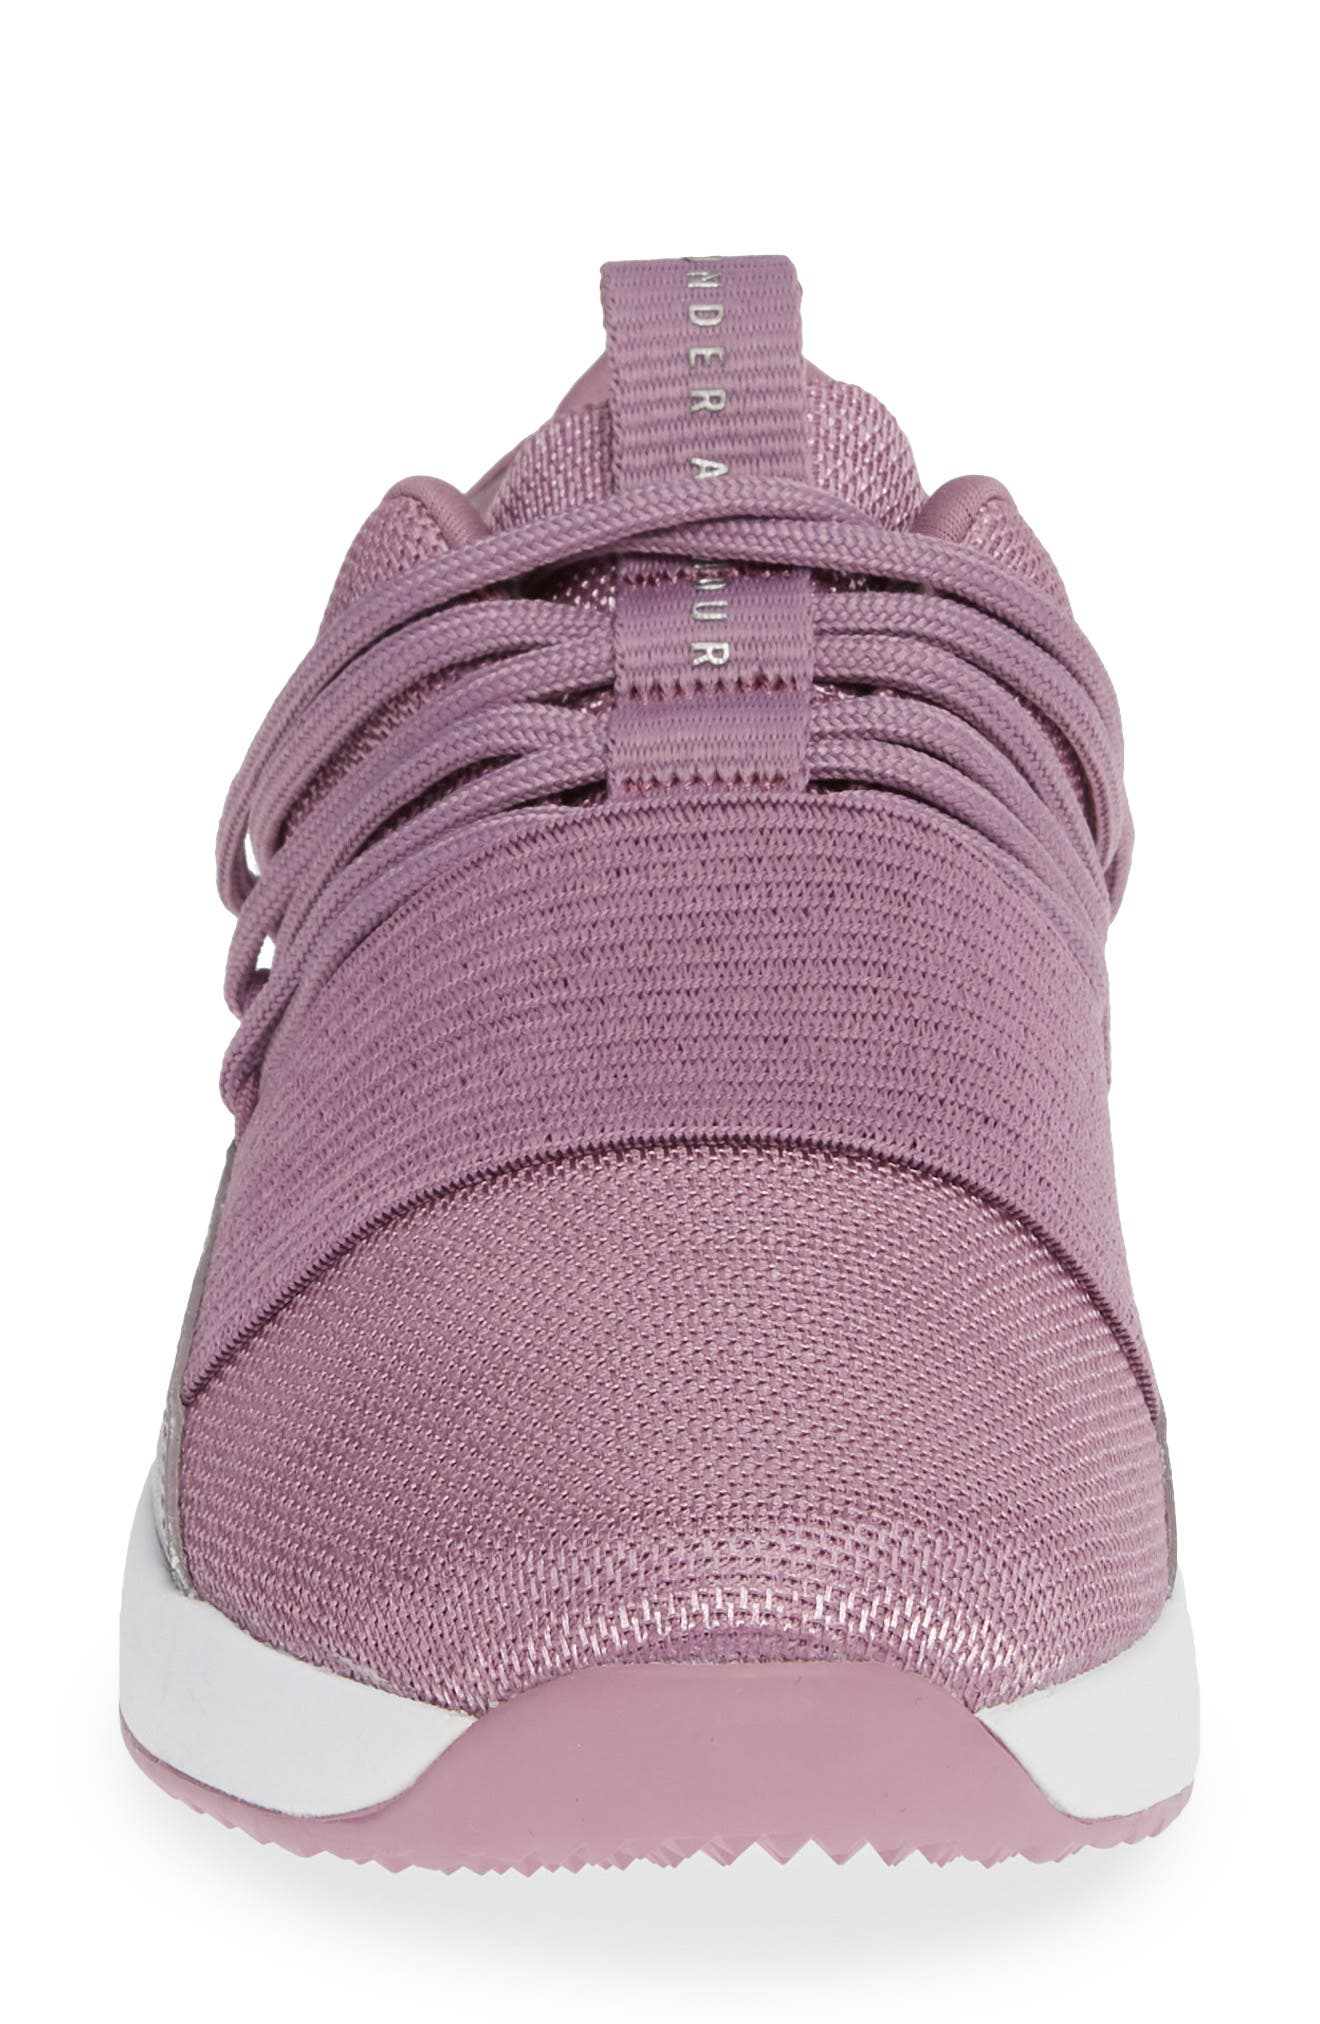 Breathe Lace X NM Sneaker,                             Alternate thumbnail 4, color,                             PURPLE PRIME/ WHITE/ WHITE